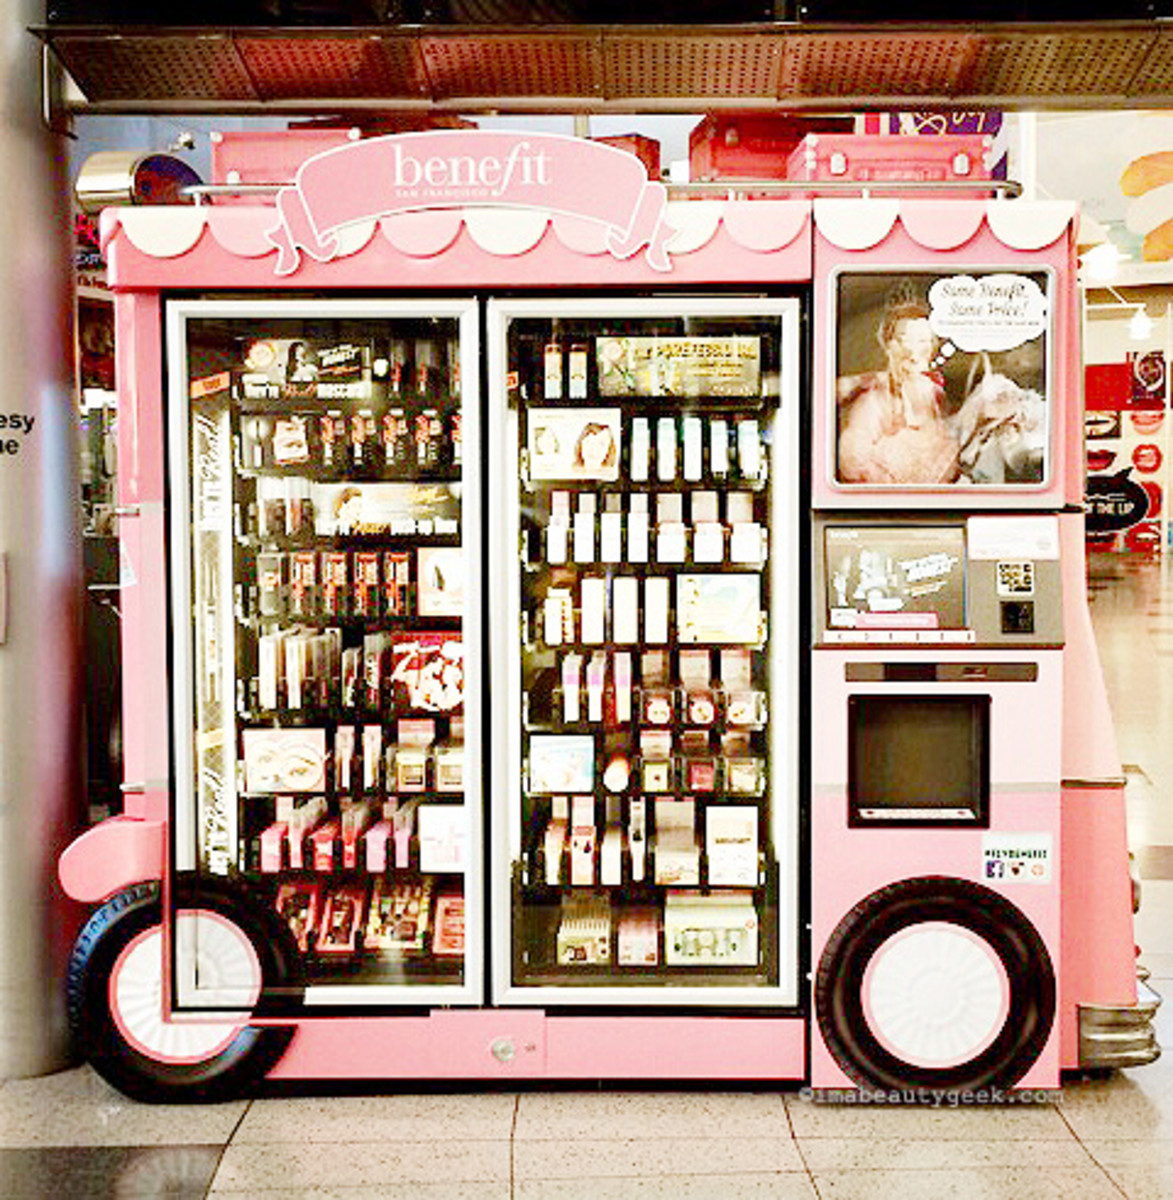 Benefit airport kiosk, Las Vegas